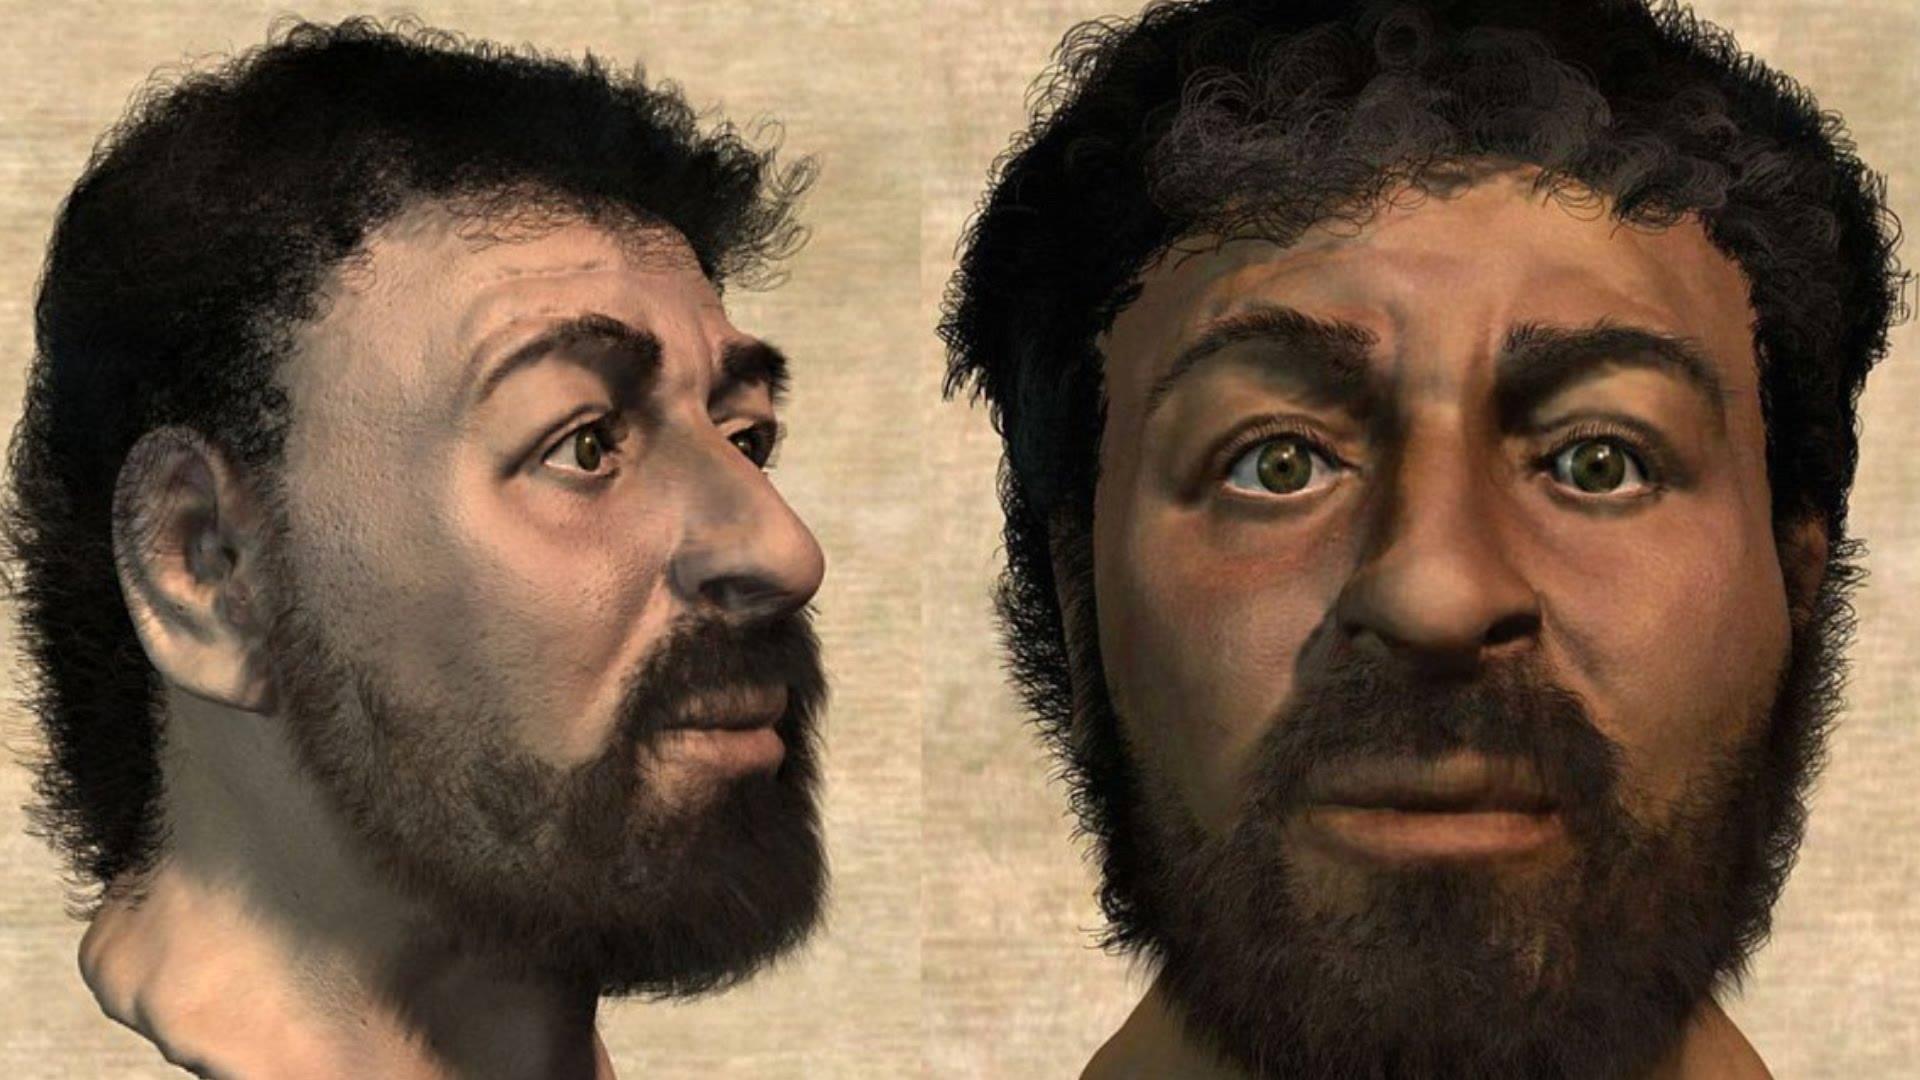 jezus-transform